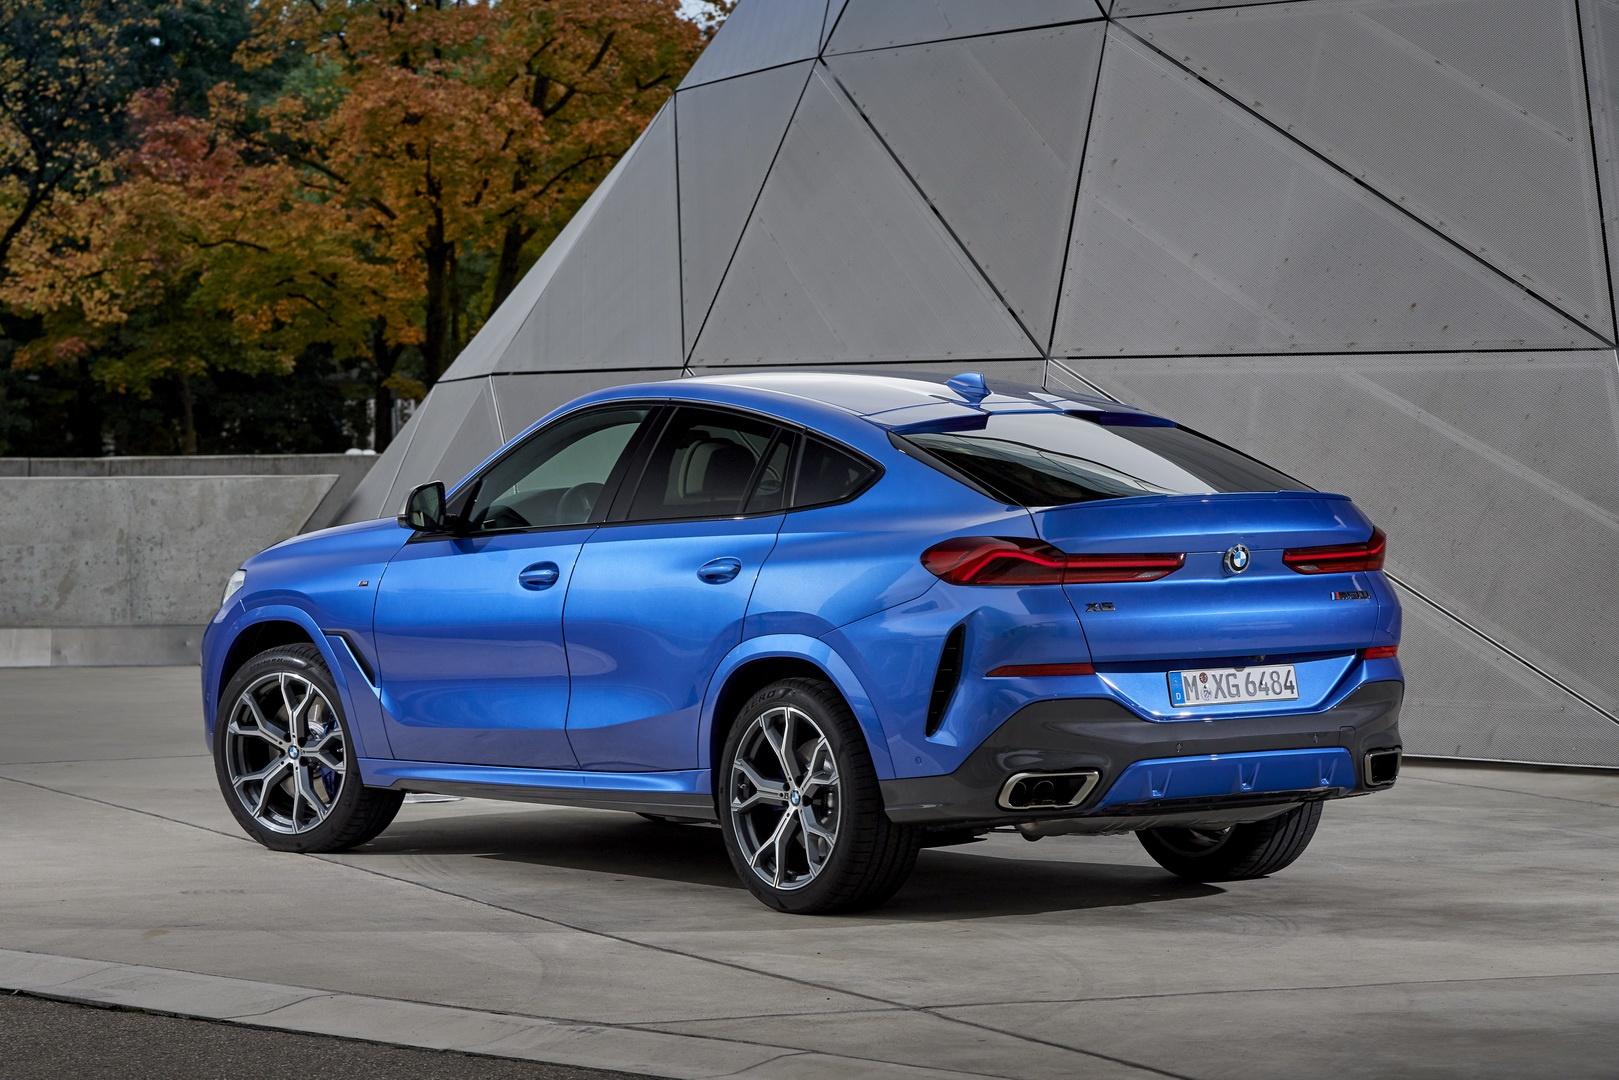 BMW X6 2020 - SUV voi suc manh sieu xe hinh anh 8